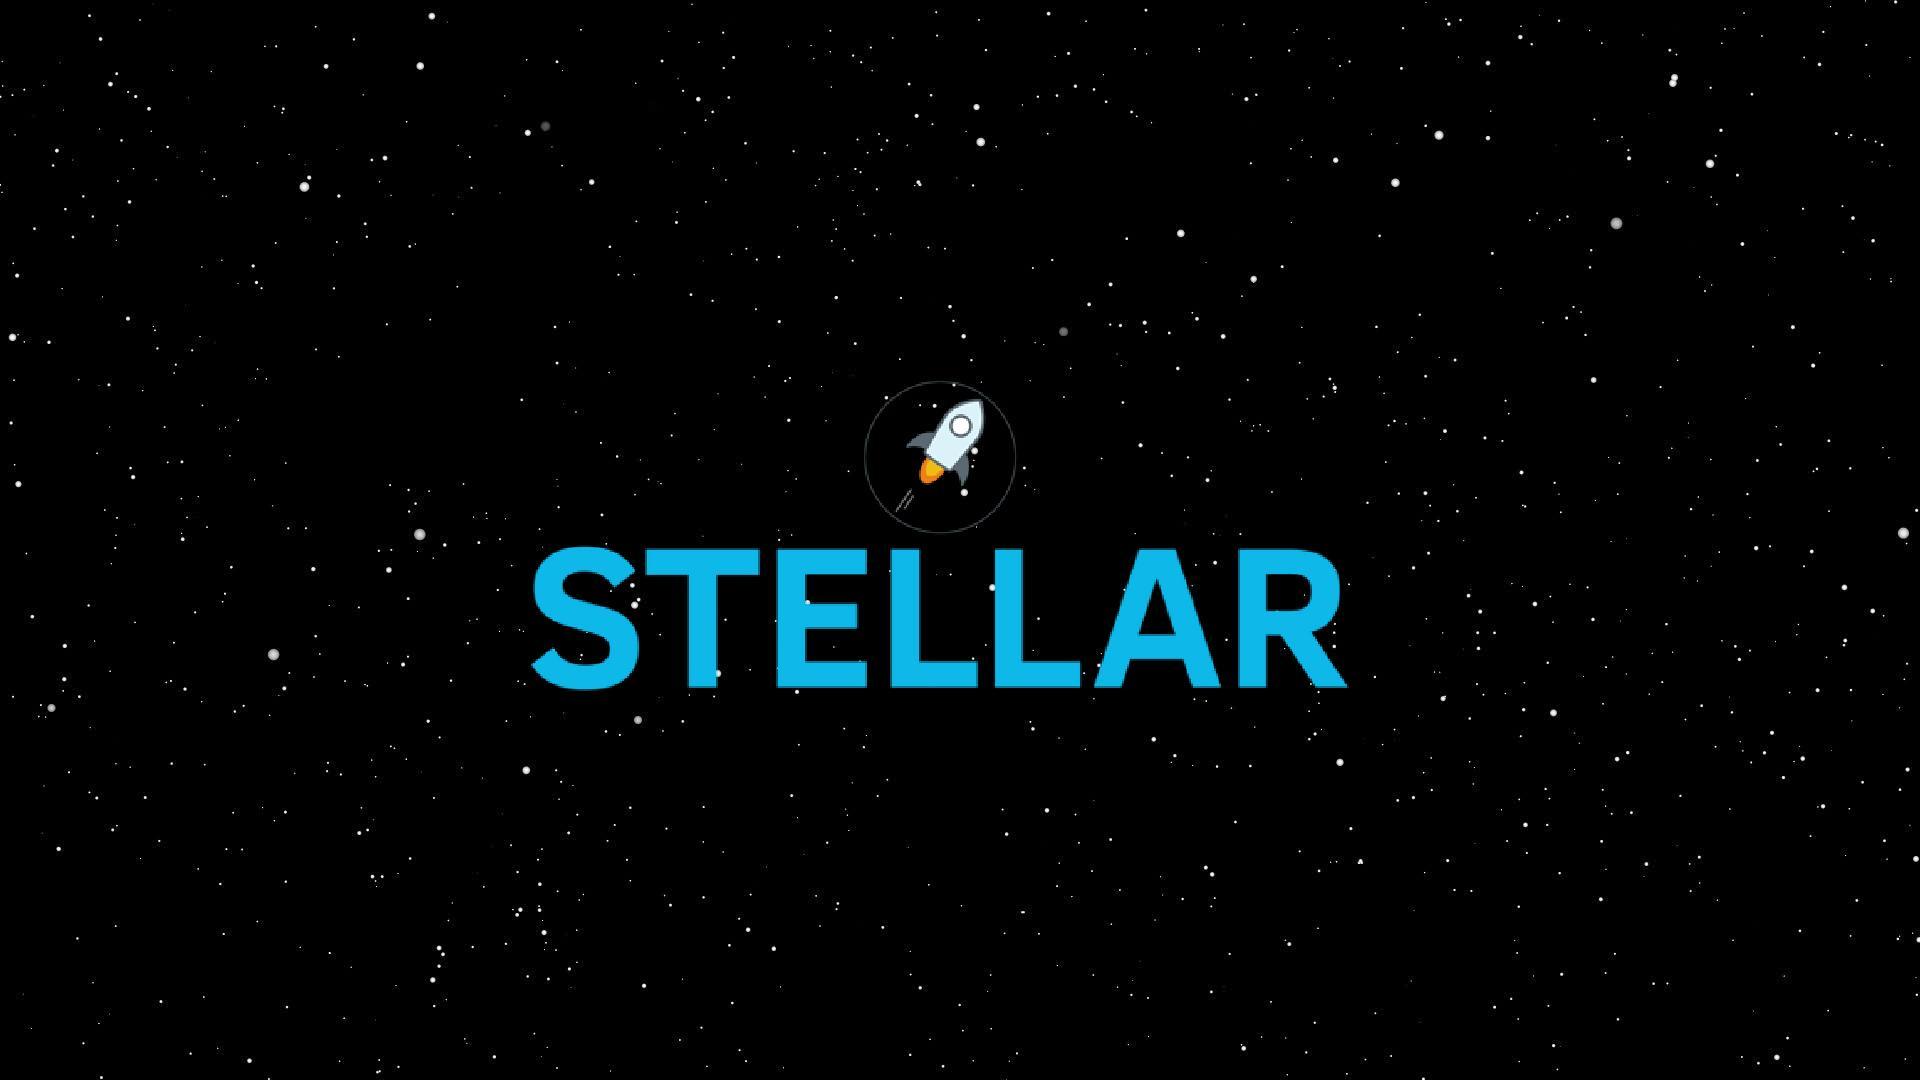 stellar5 - Stellar diretta concorrente di Ethereum come piattaforma per ICO